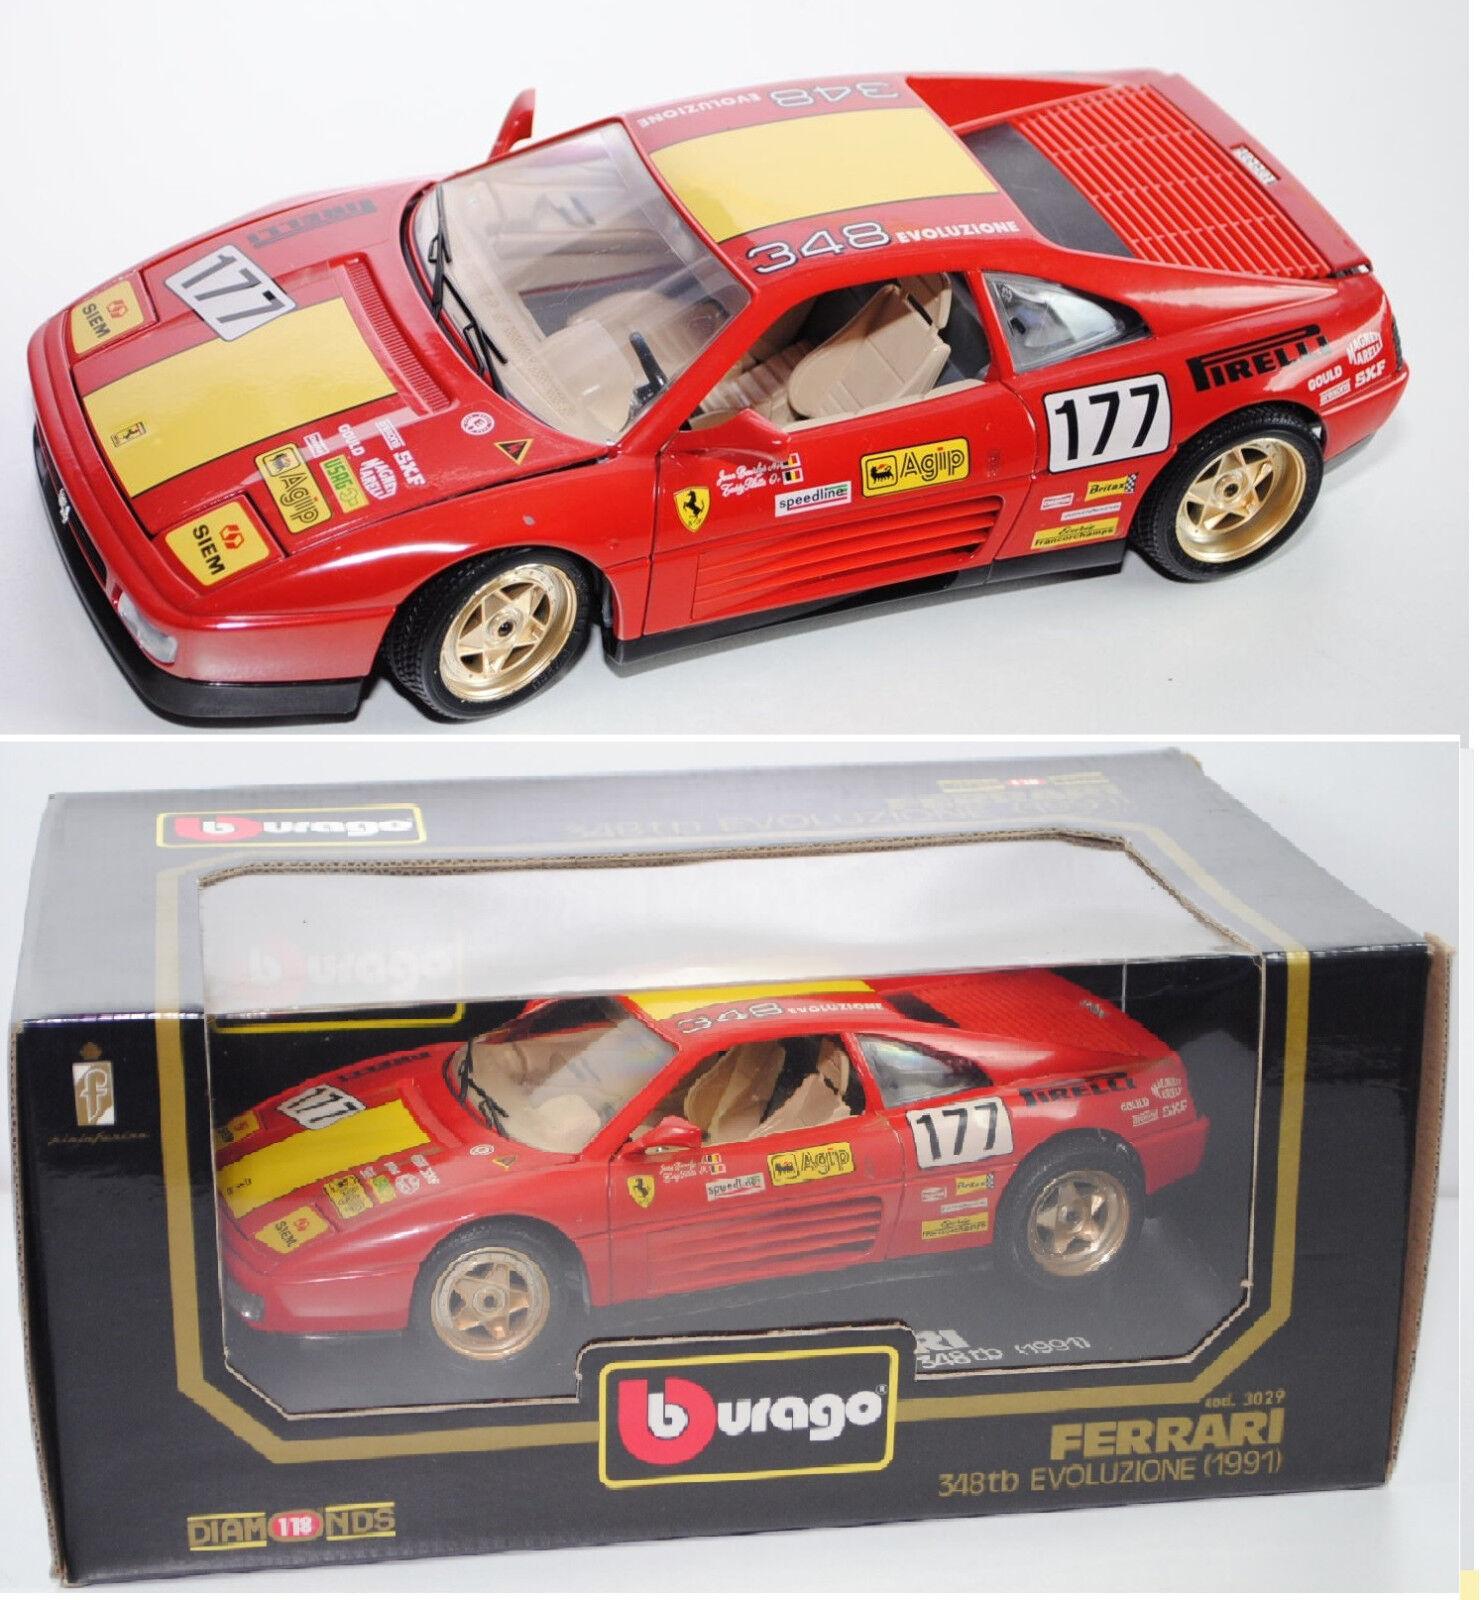 Bburago 3029 Ferrari 348 to Evoluzione, rouge CORSA (Rouge), Nº 177, 1 18